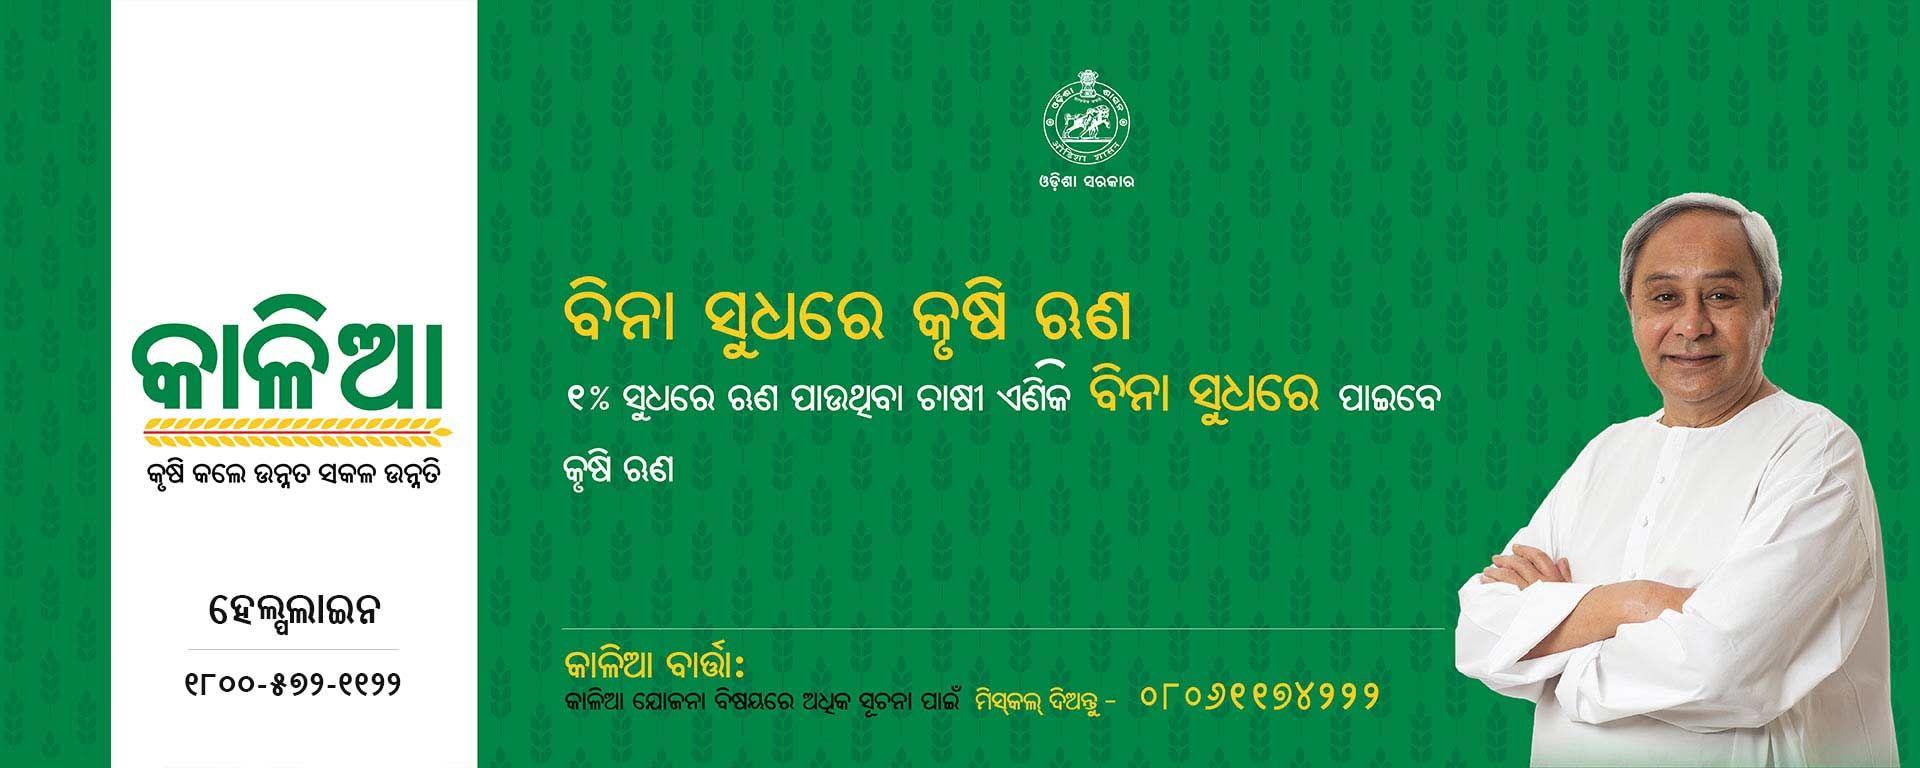 KALIA Scheme odisha, Kaliya Scheme Beneficiary List, kalia